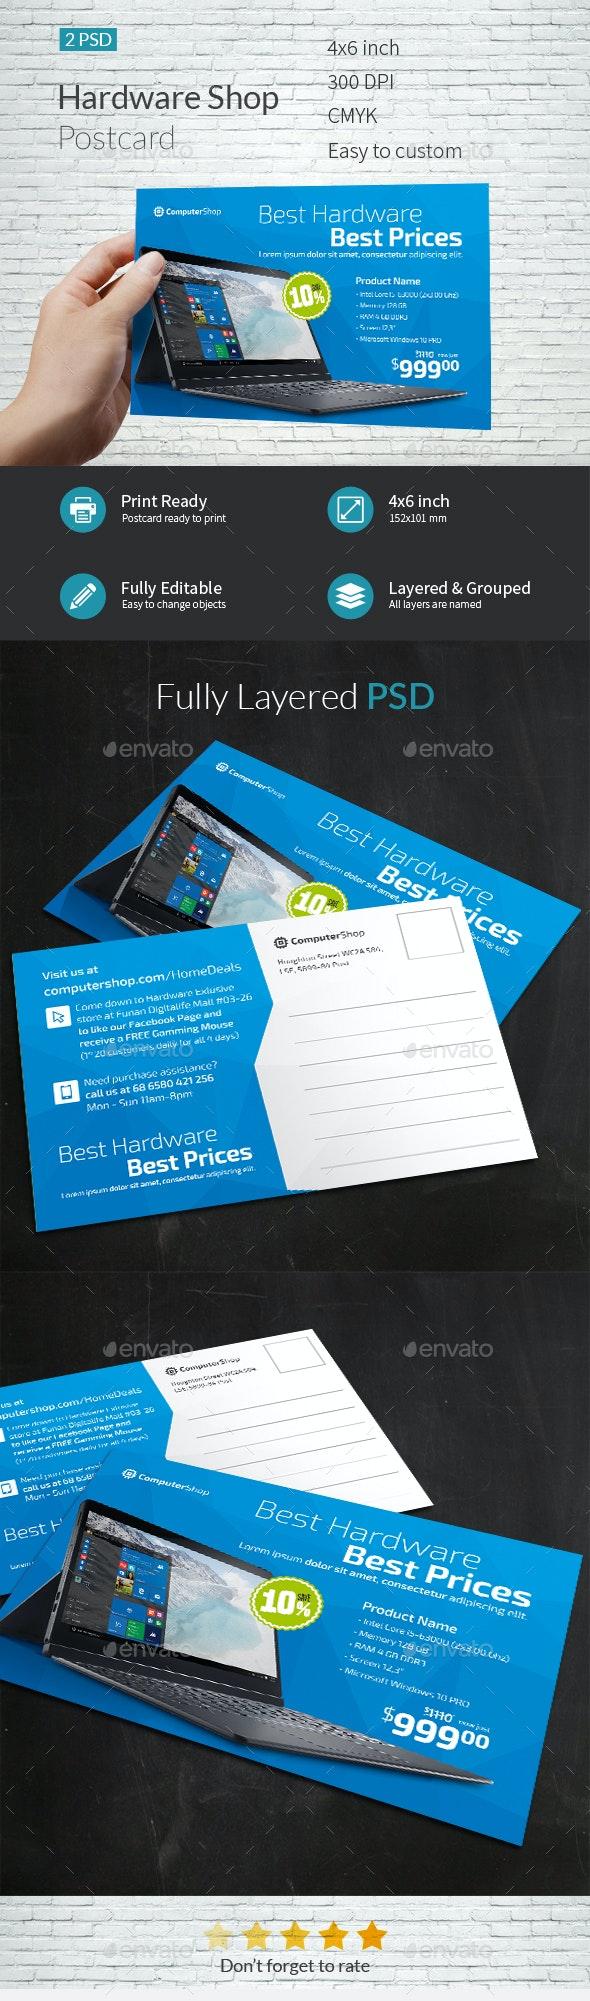 Computer Hardware Shop Postcard Template - Cards & Invites Print Templates